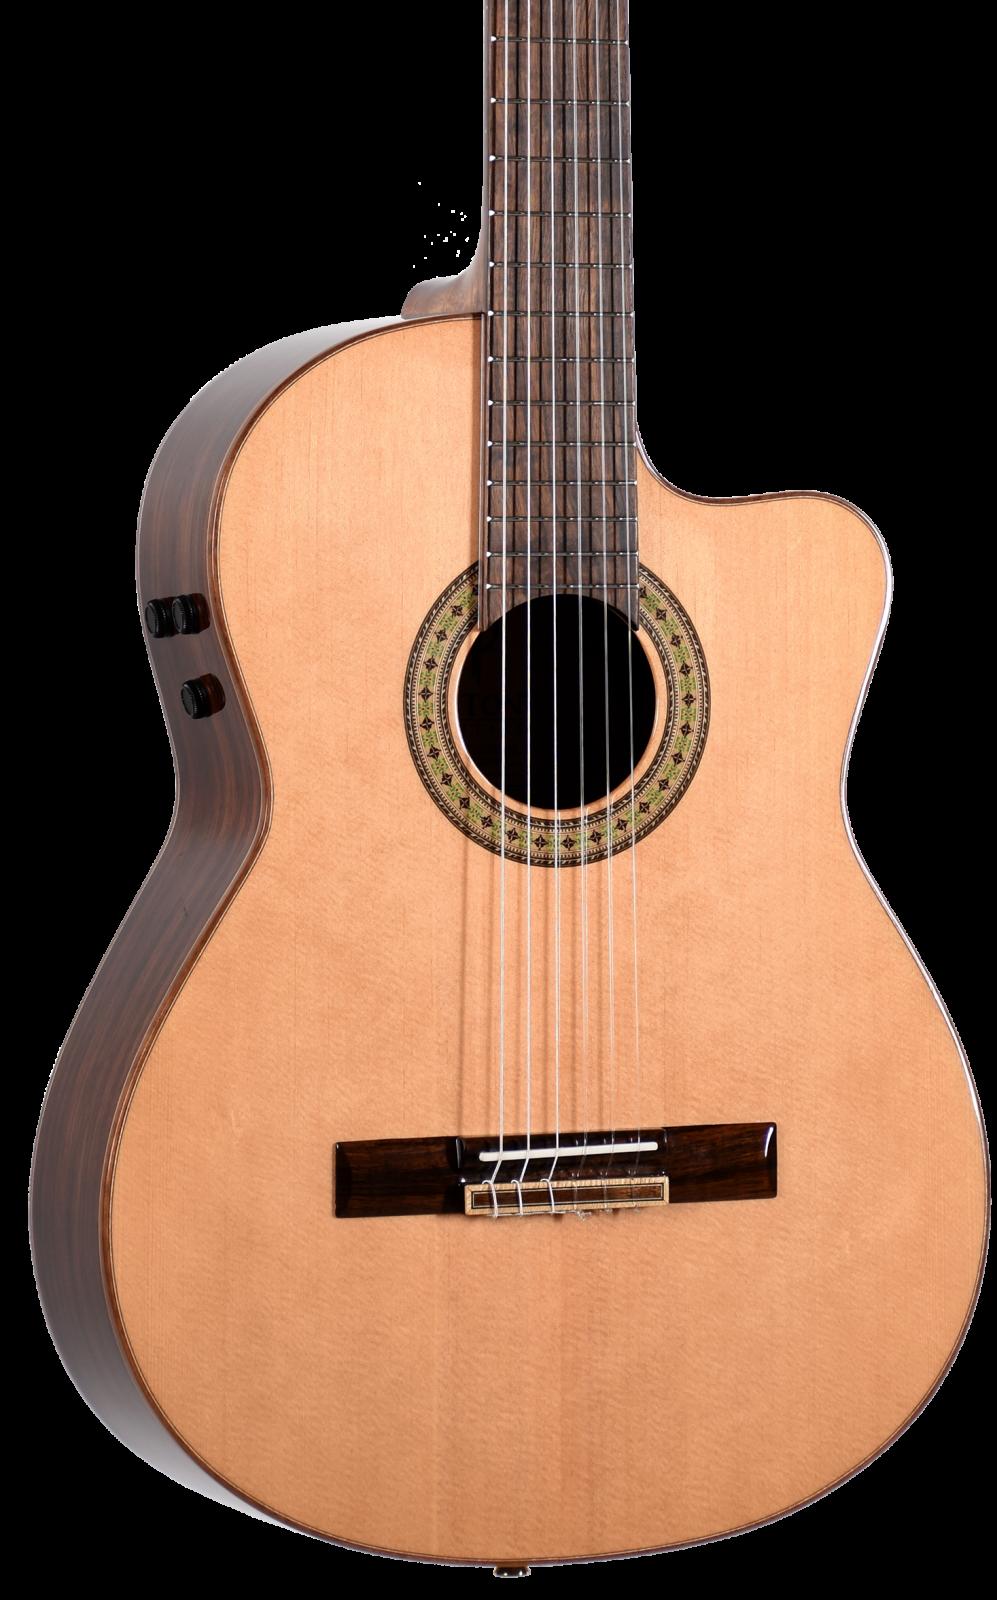 Teton STC180CENT Solid Spruce Top Ebony B&S Classical Guitar